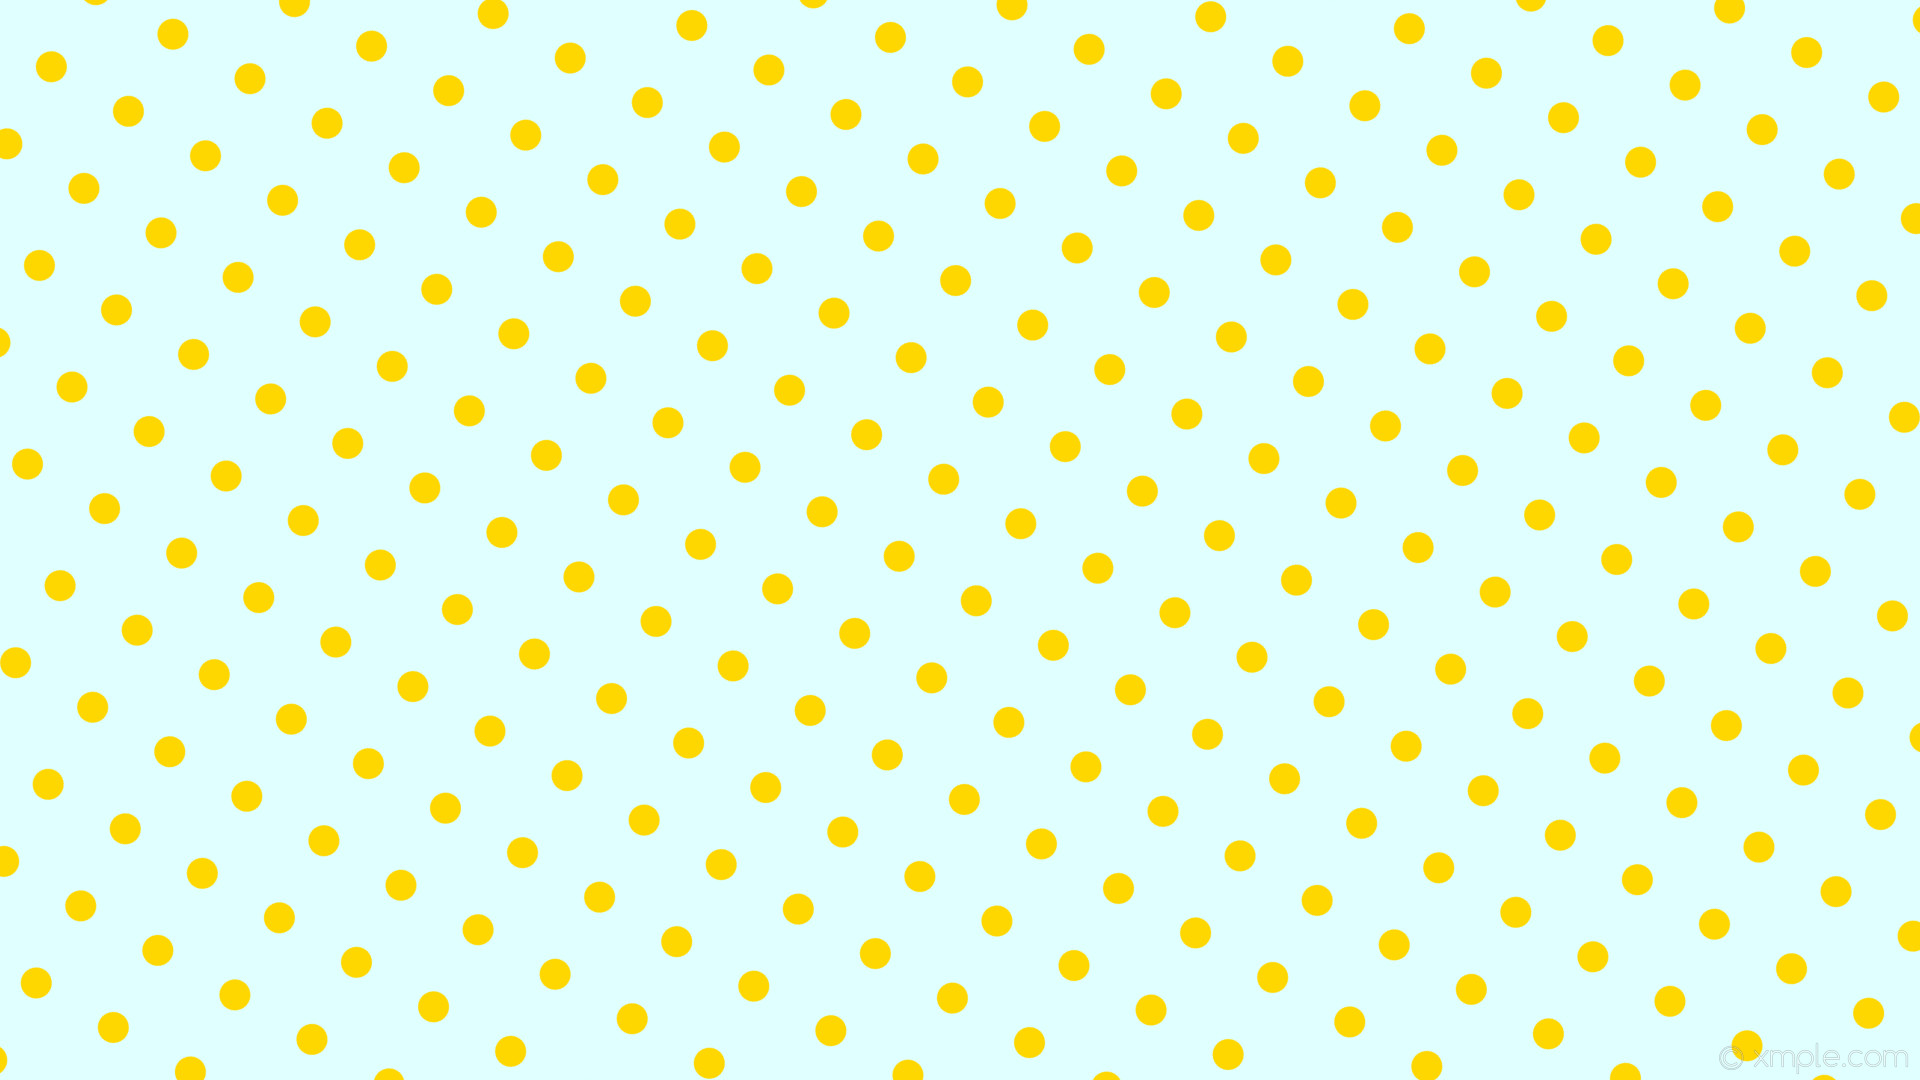 polka dot bokeh orange background stock illustration illustration